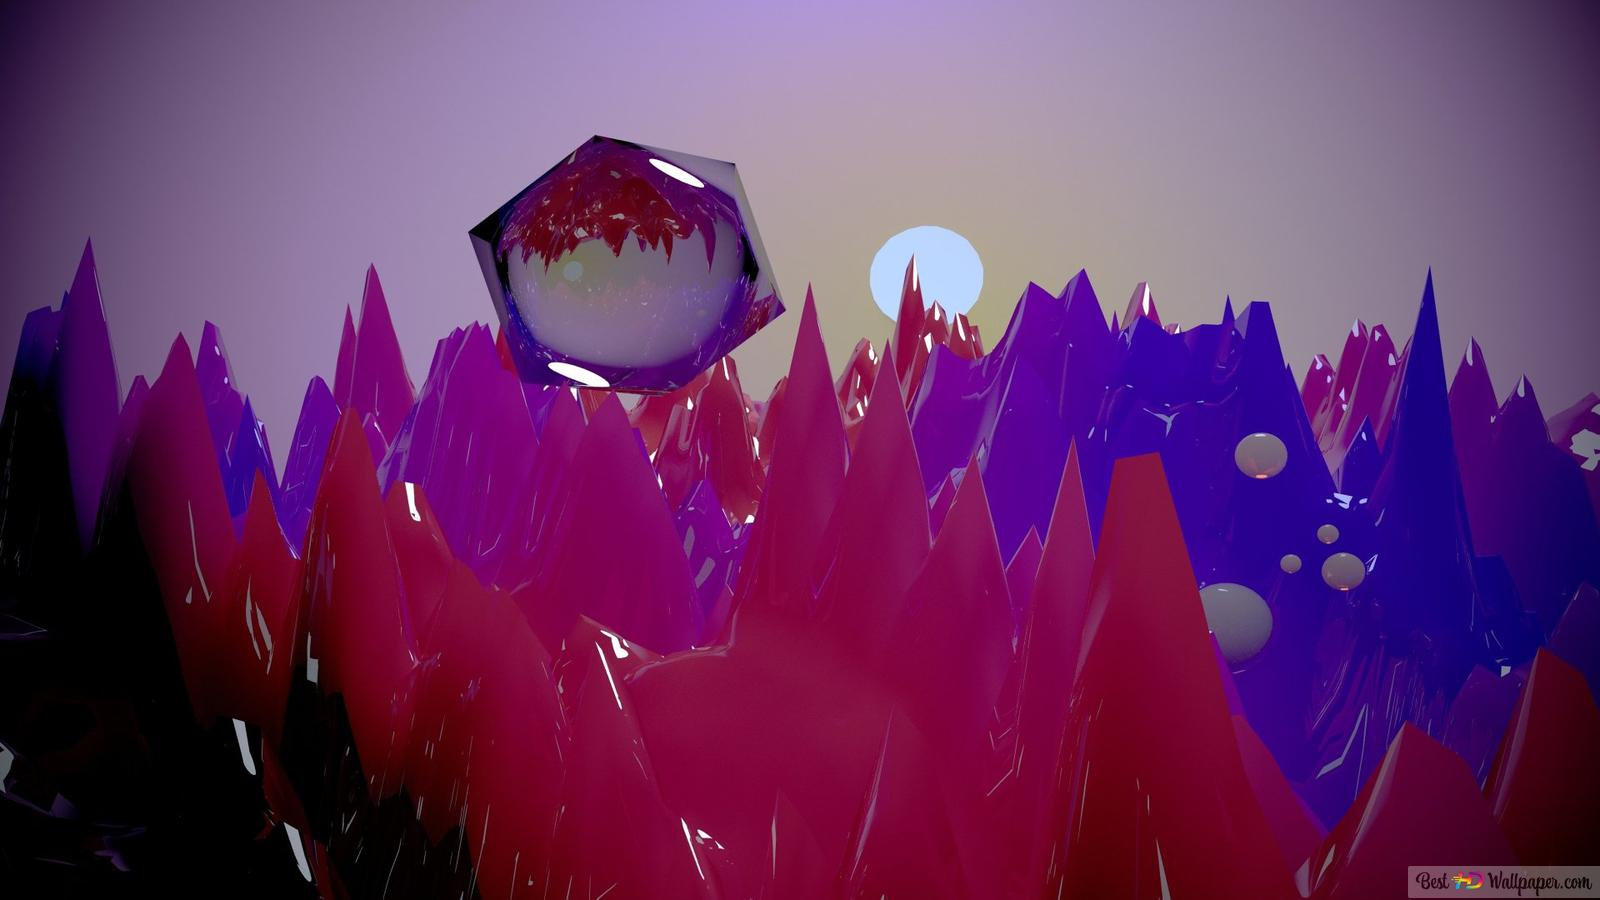 Digital Art Vaporwave Hd Wallpaper Download